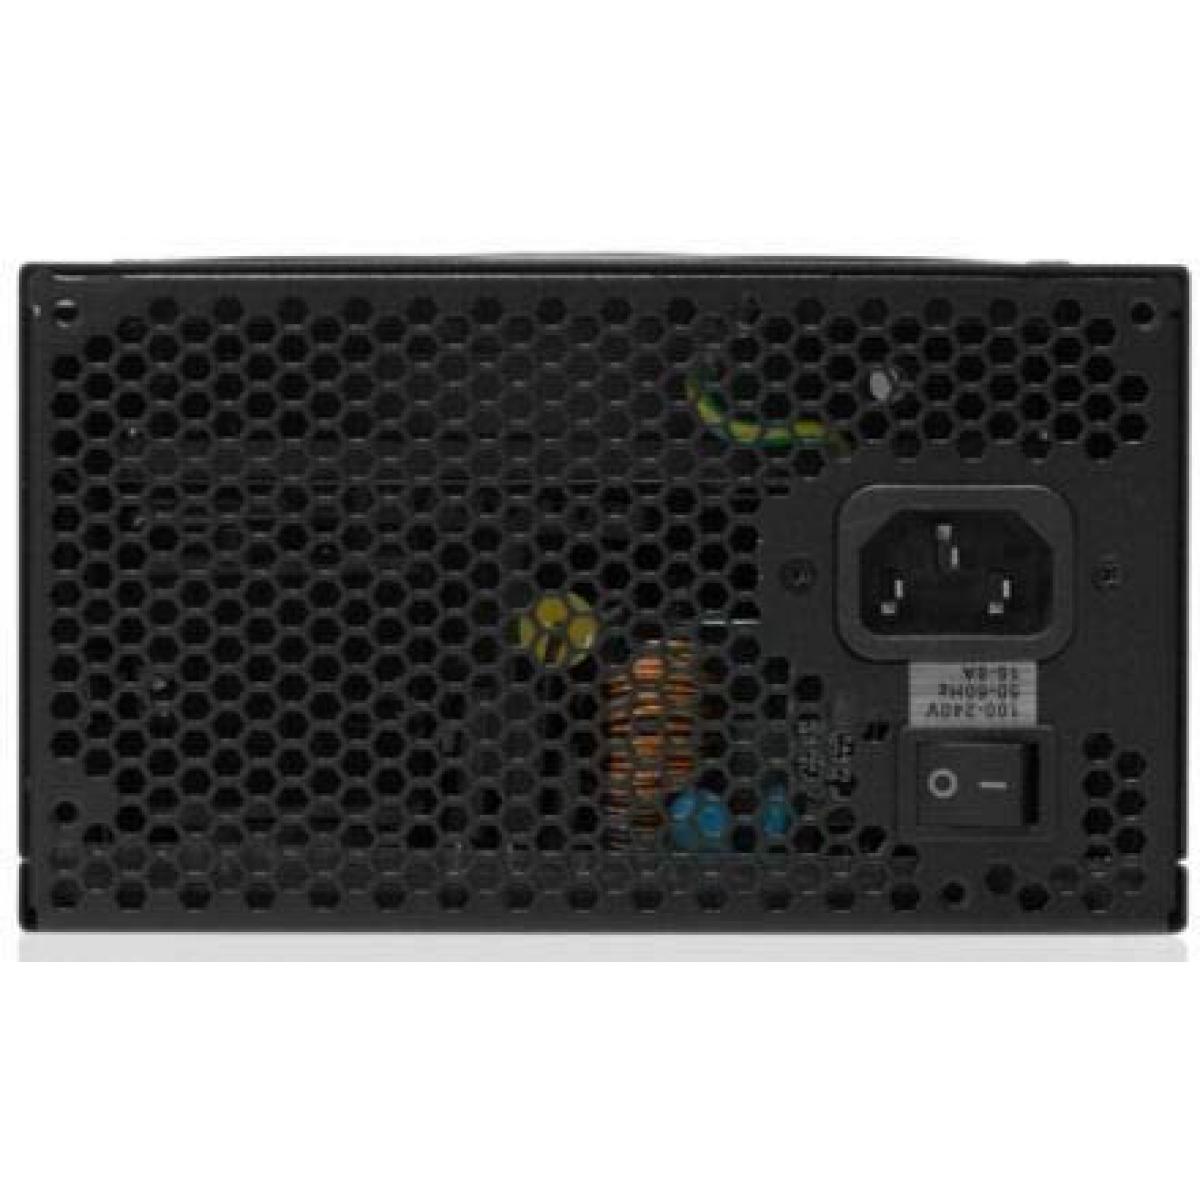 Fonte Riotoro Builder Edition 1200W, 80 Plus Gold, PFC Ativo, Full Modular, PR-GP1200FM-NA